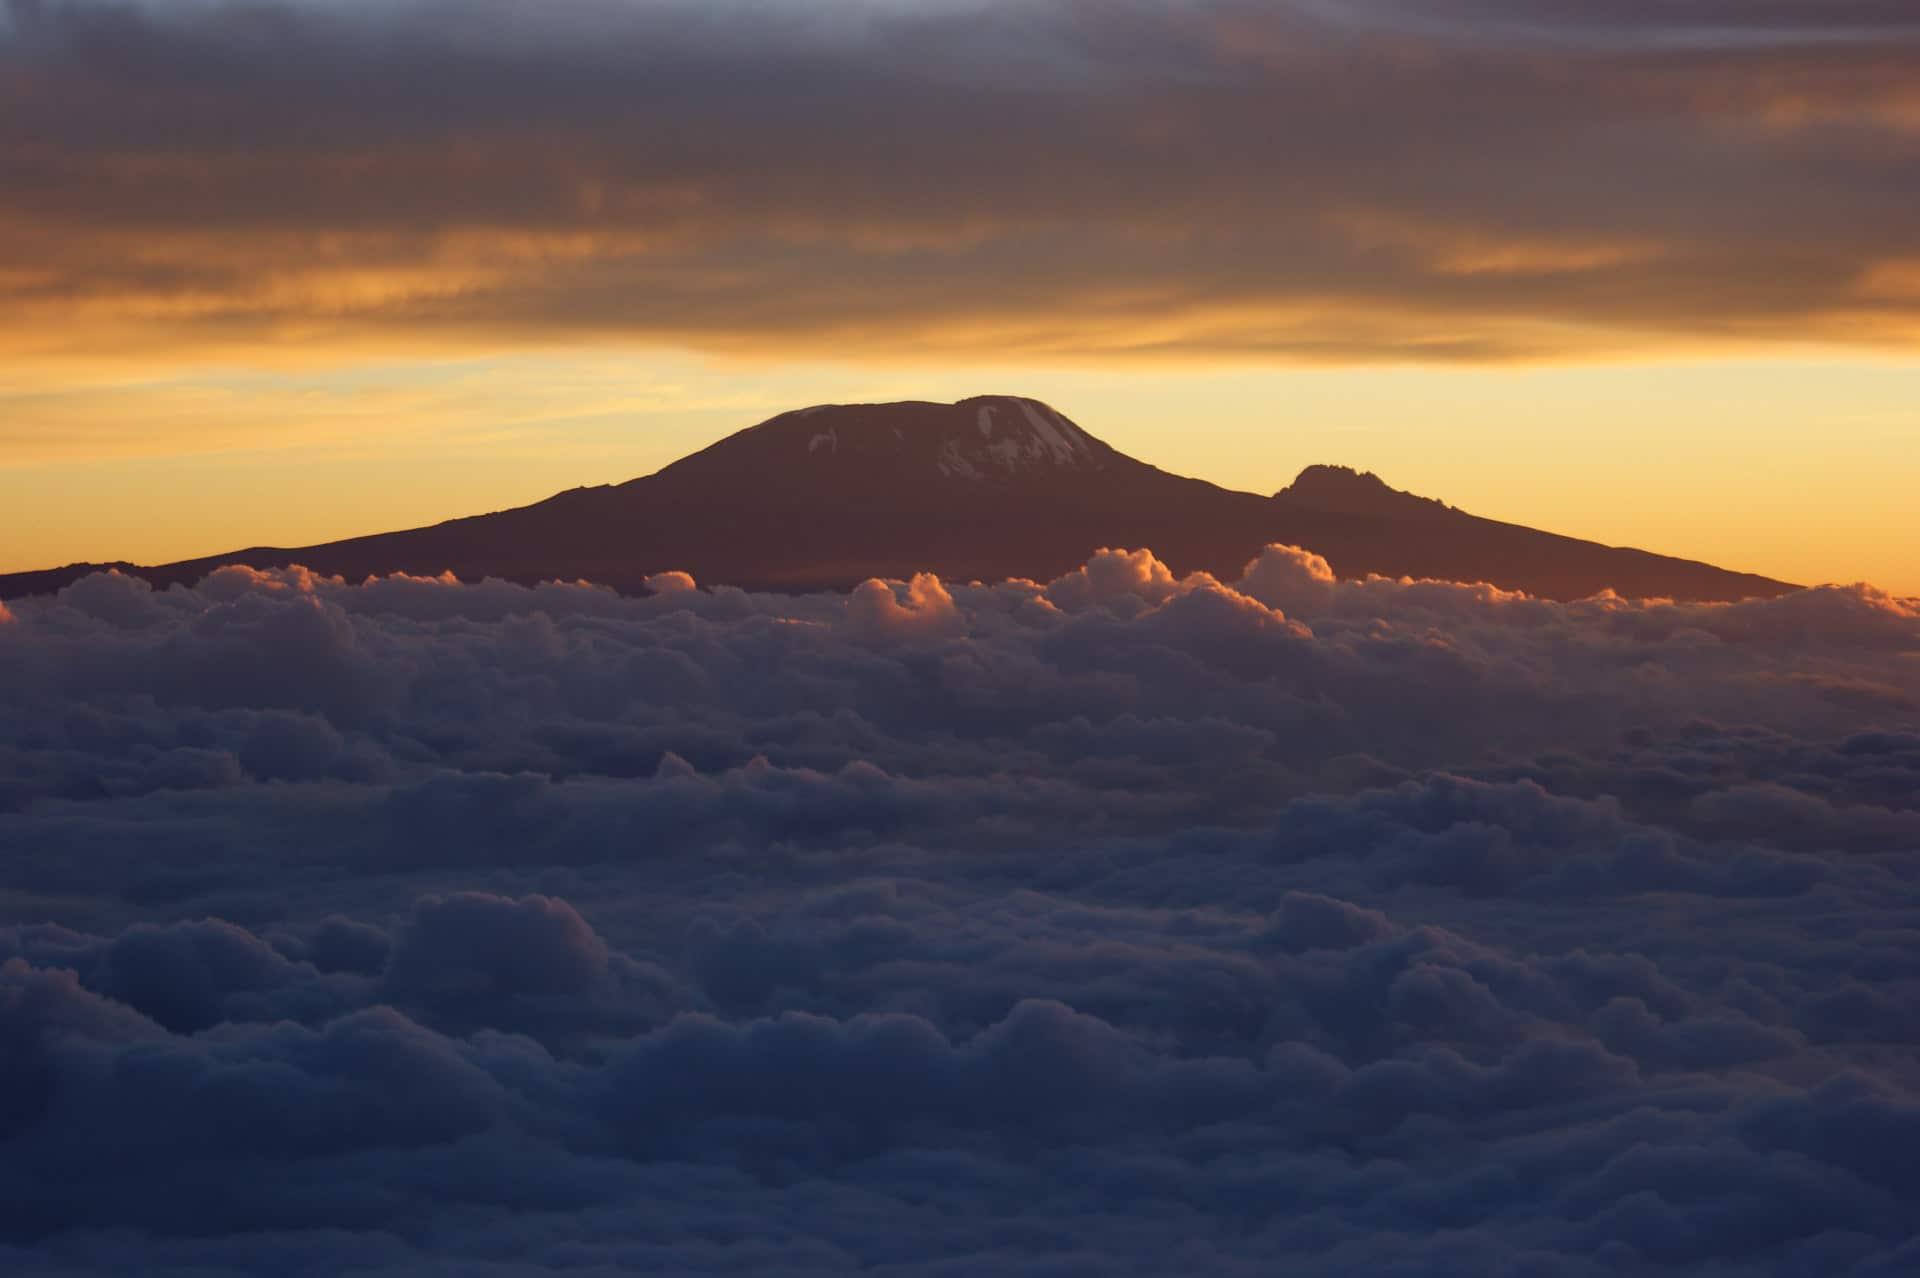 Kilimanjaro-Tansania-Globetrotter-Select-Krause5